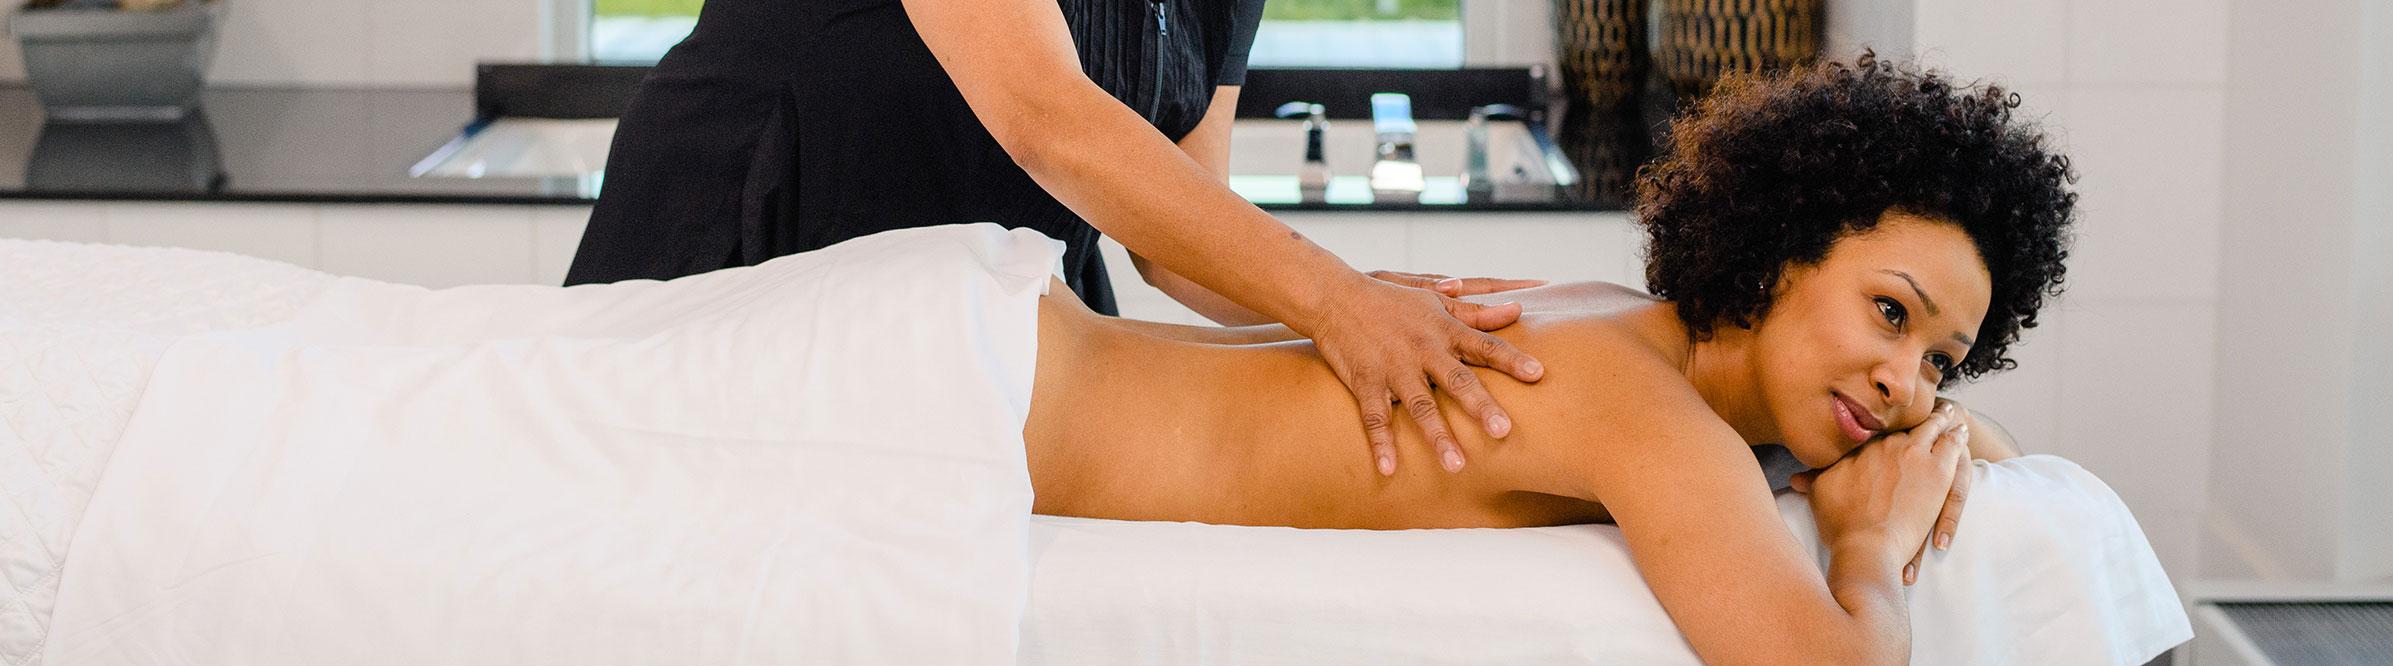 health-wellness-massage